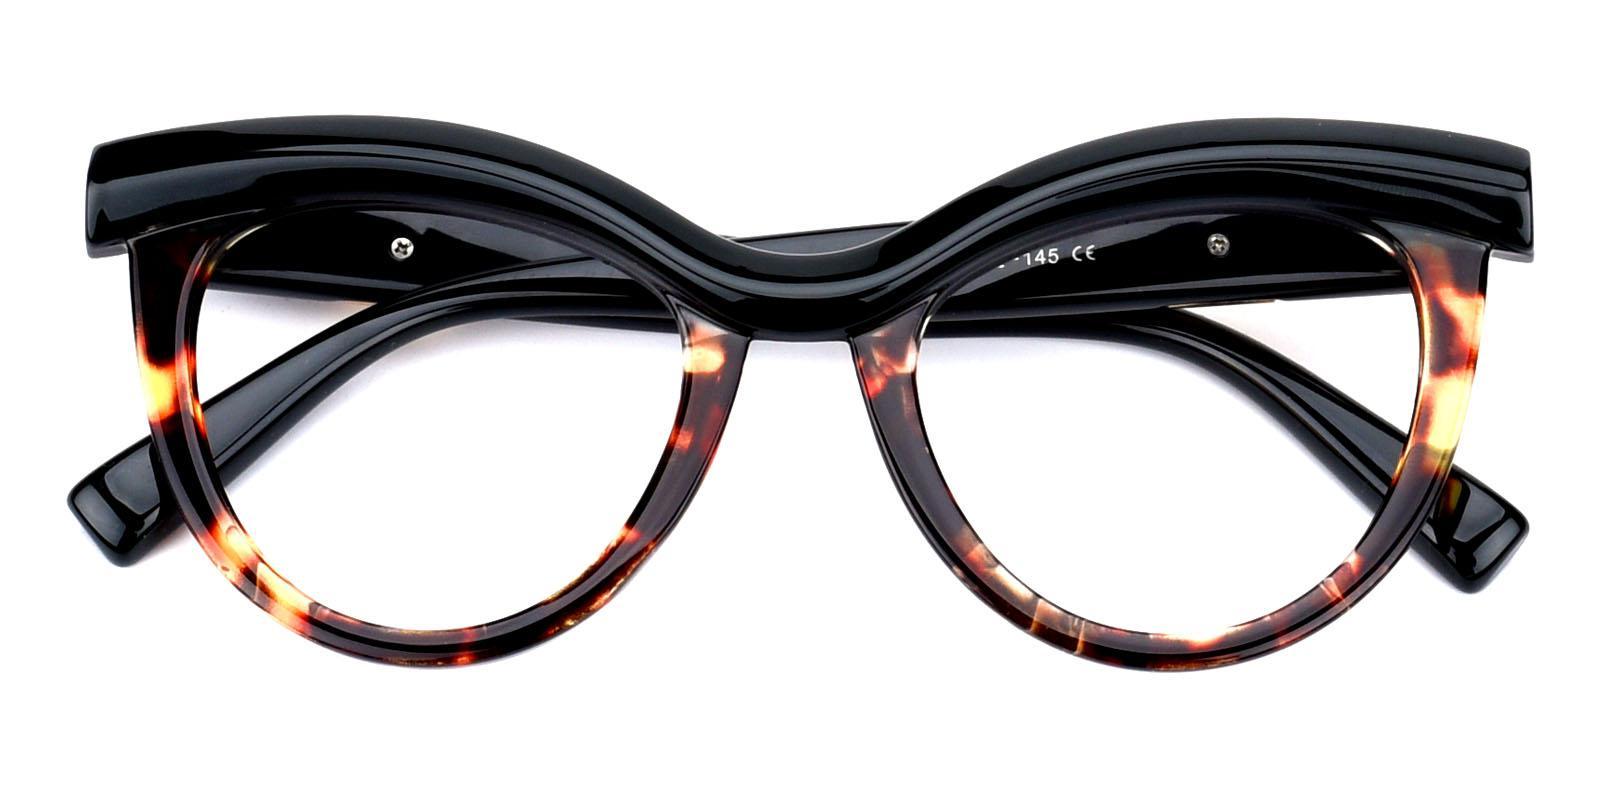 Traci-Green-Cat-Plastic-Eyeglasses-detail